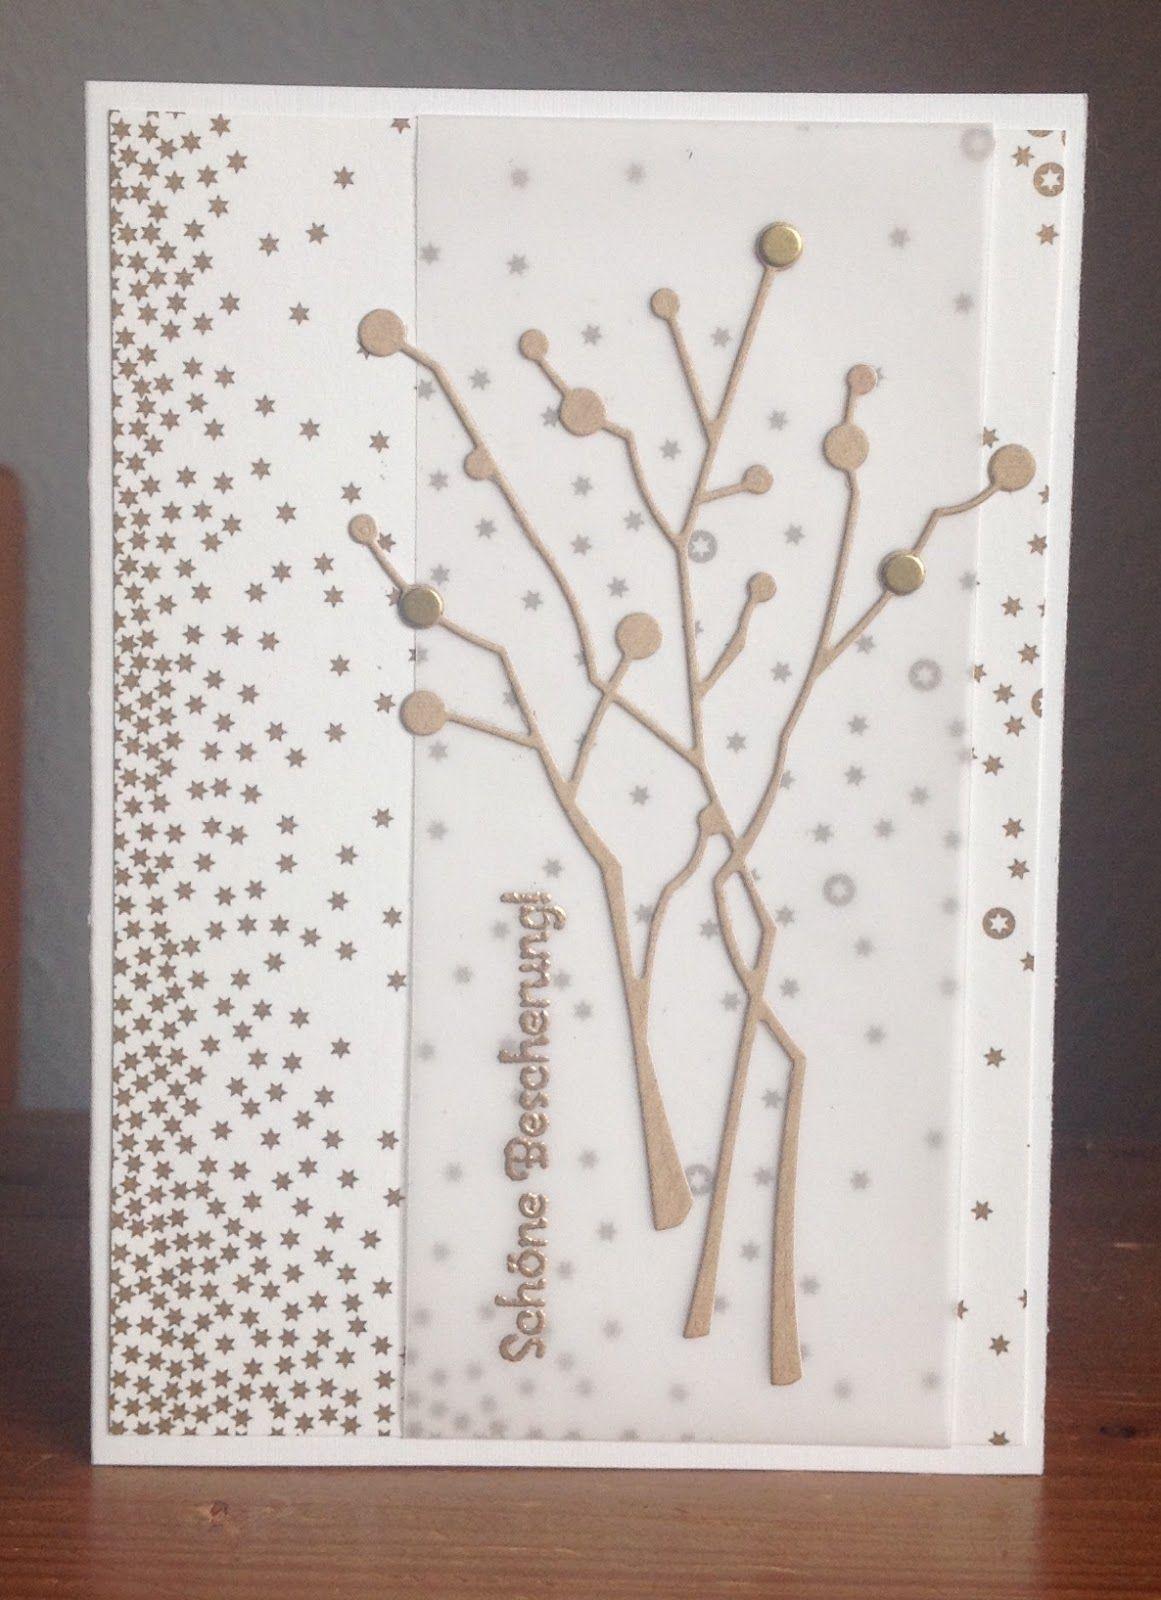 Weihnachtskarten alexandra renke modern stempel su weihnachtskarten pinterest - Pinterest weihnachtskarten ...